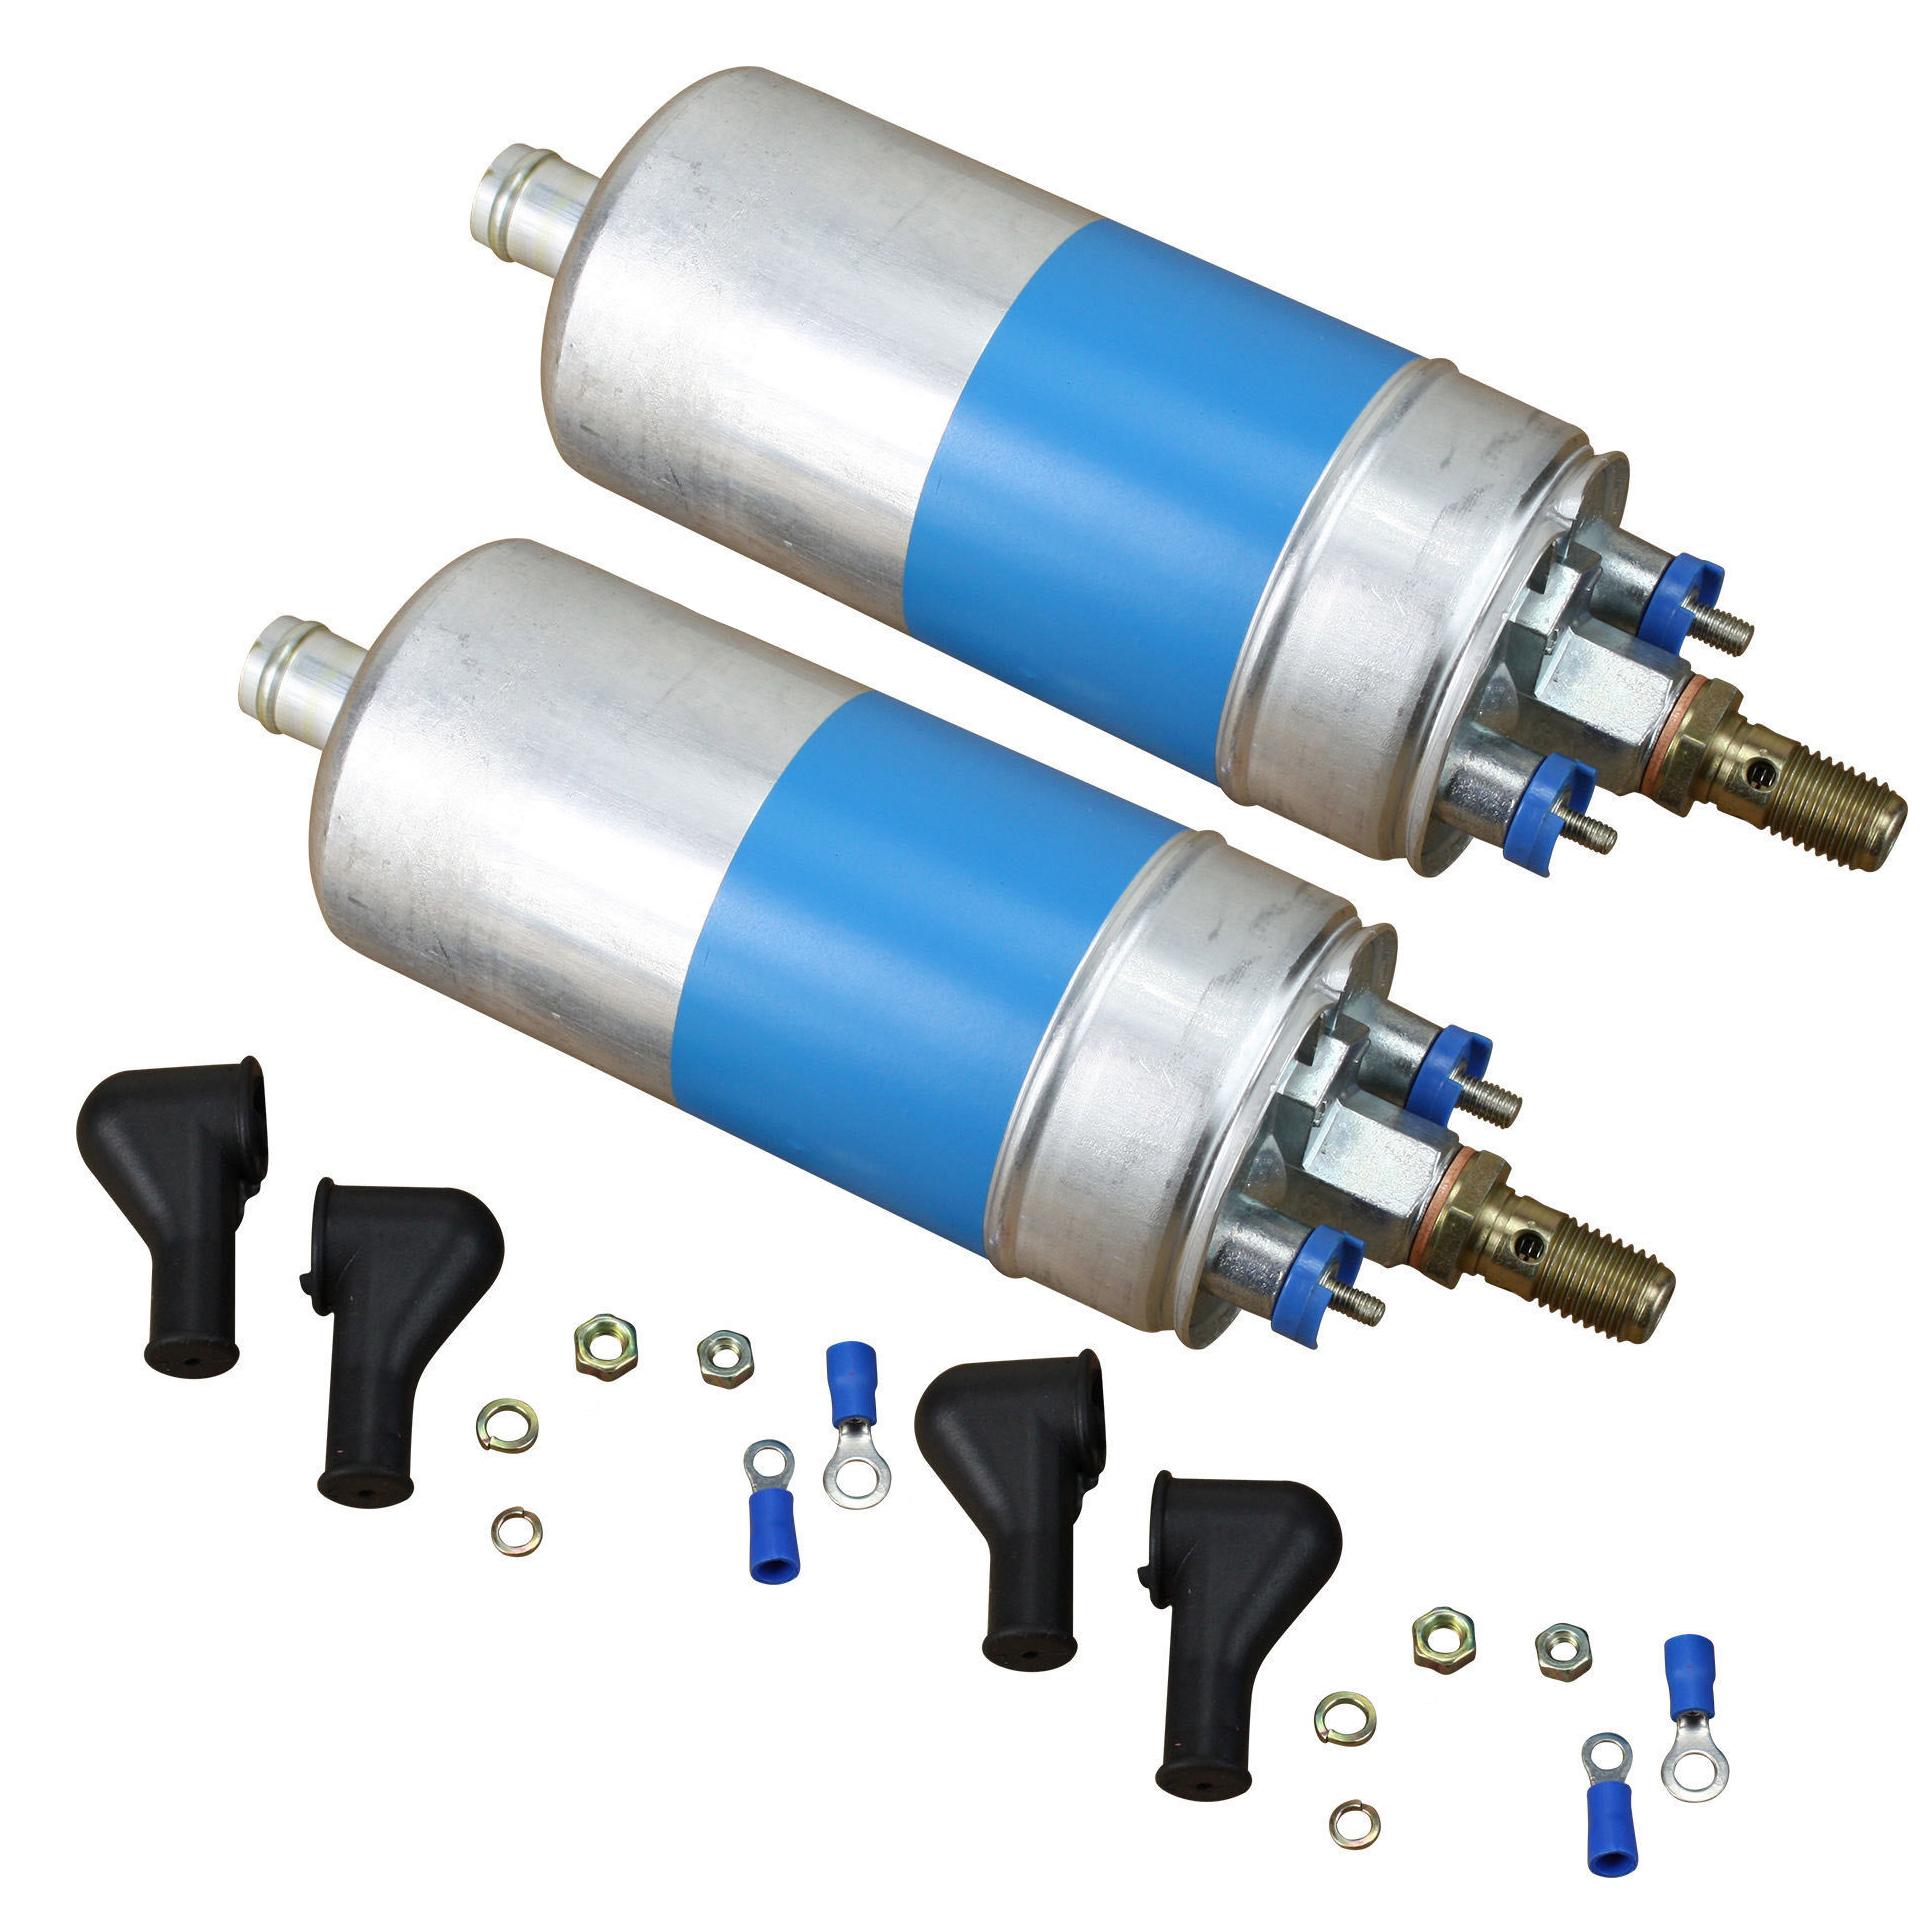 hight resolution of details about pair mercedes fuel pumps w140 w202 sl320 sl500 sl600 s600 s500 s420 190e 300e